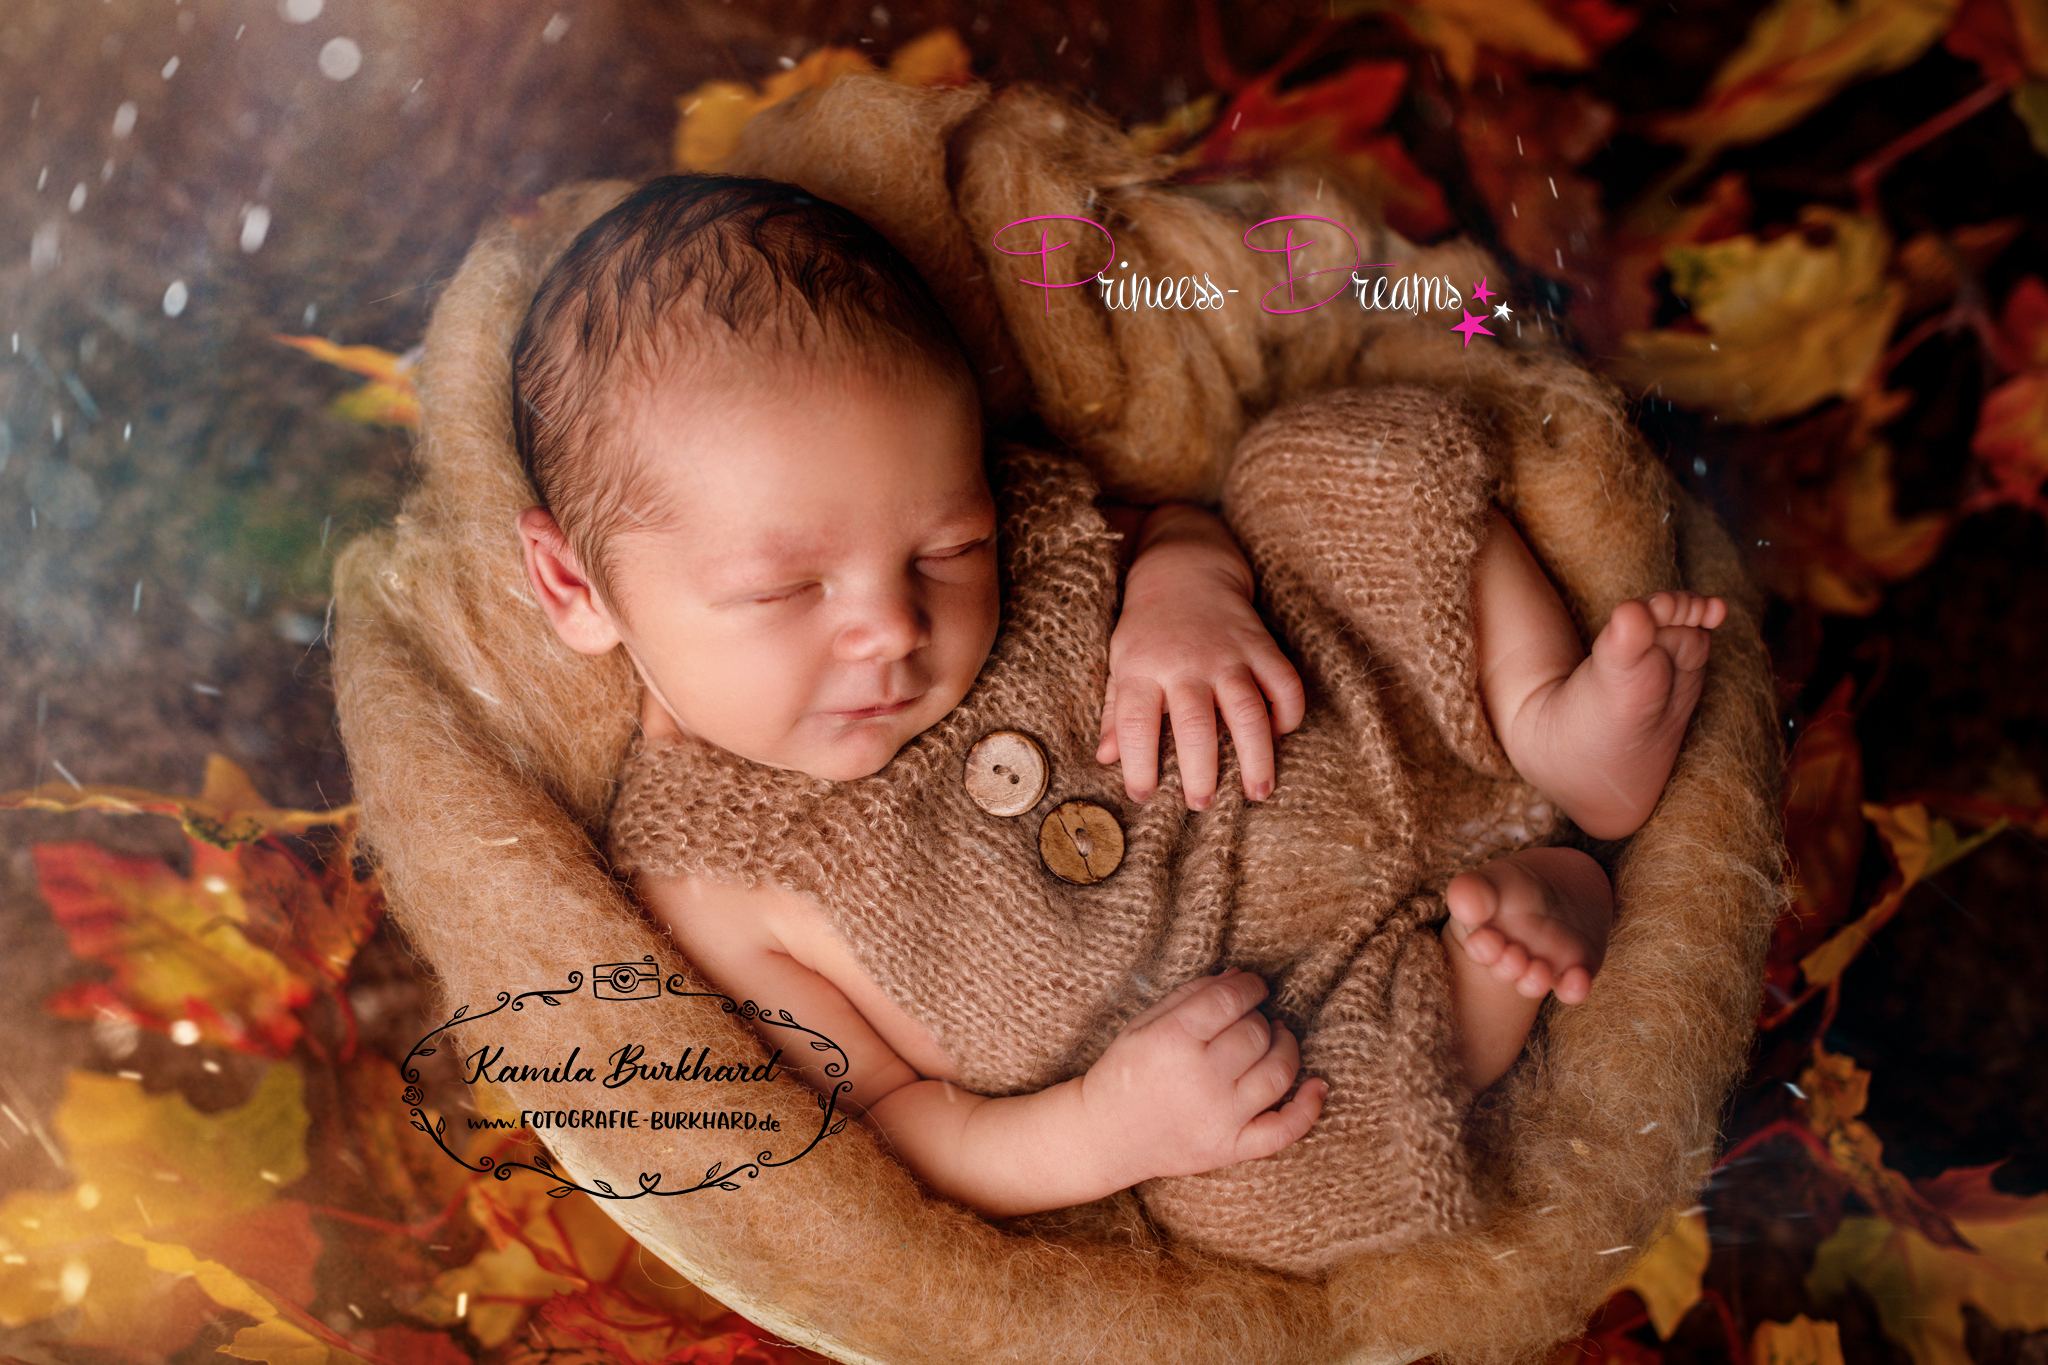 Baby Fotografie Neugborenen Strick Set Jungen Body Shooting Outfit Jungen Set Fotoshooting Baby Fotografie Neugeborenen Mohair Outfit